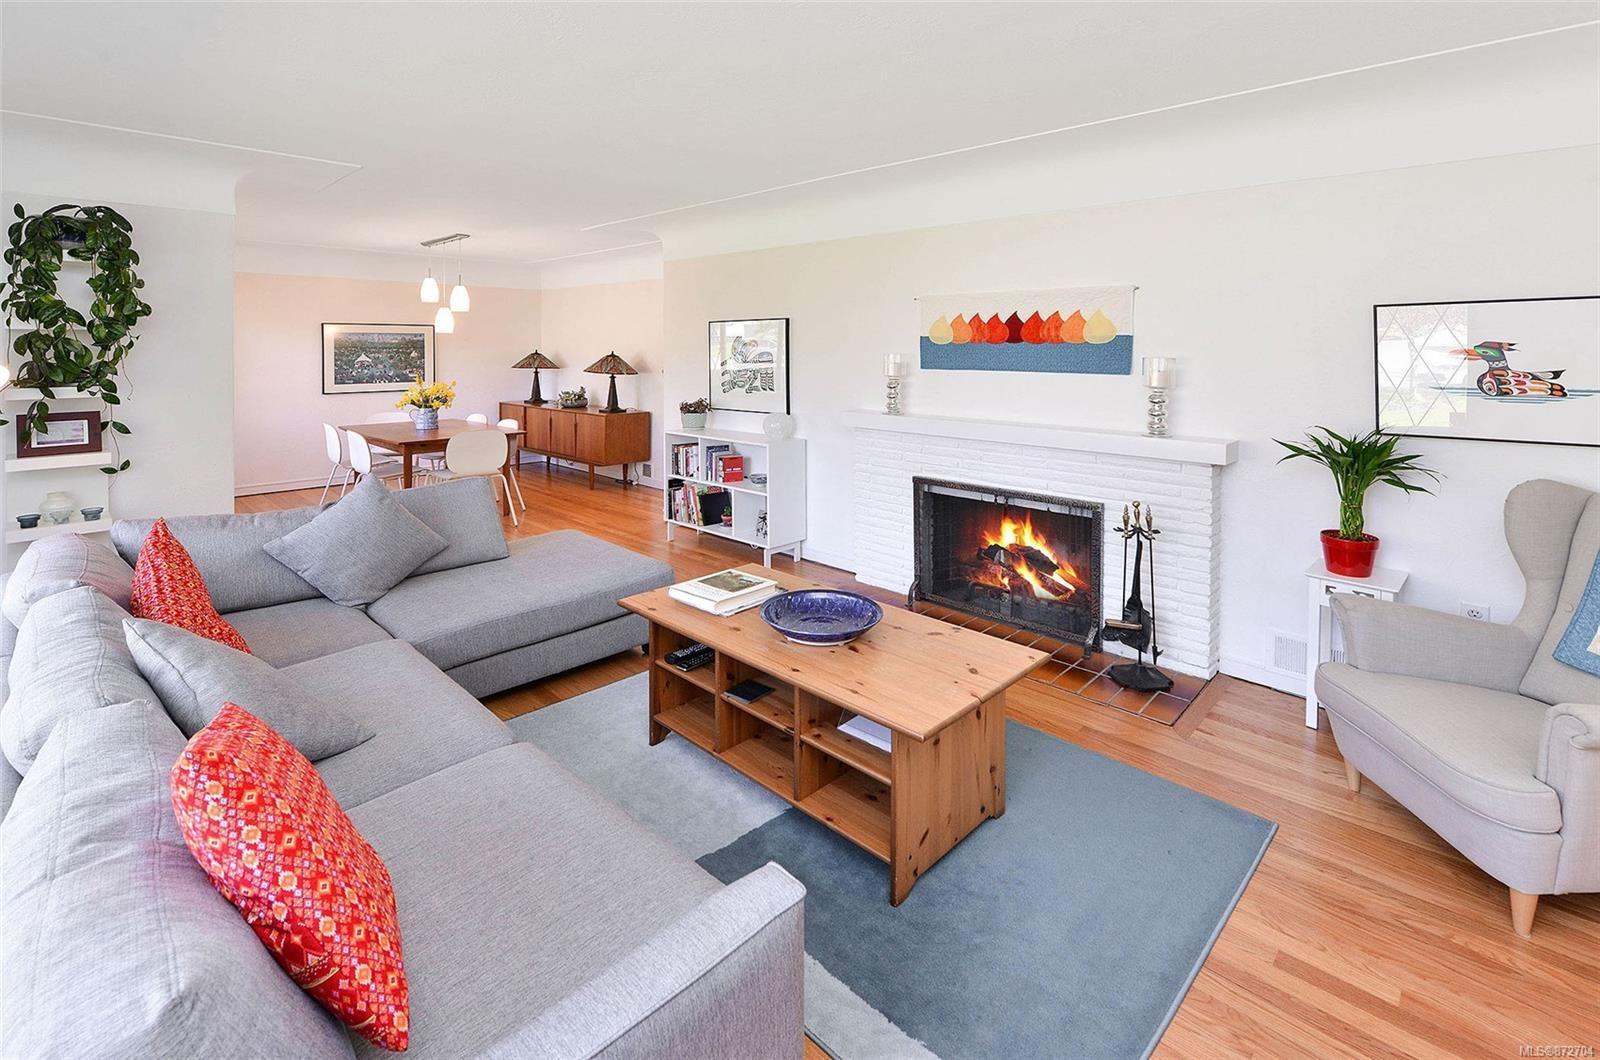 Photo 6: Photos: 2183 Sandowne Rd in : OB Henderson House for sale (Oak Bay)  : MLS®# 872704